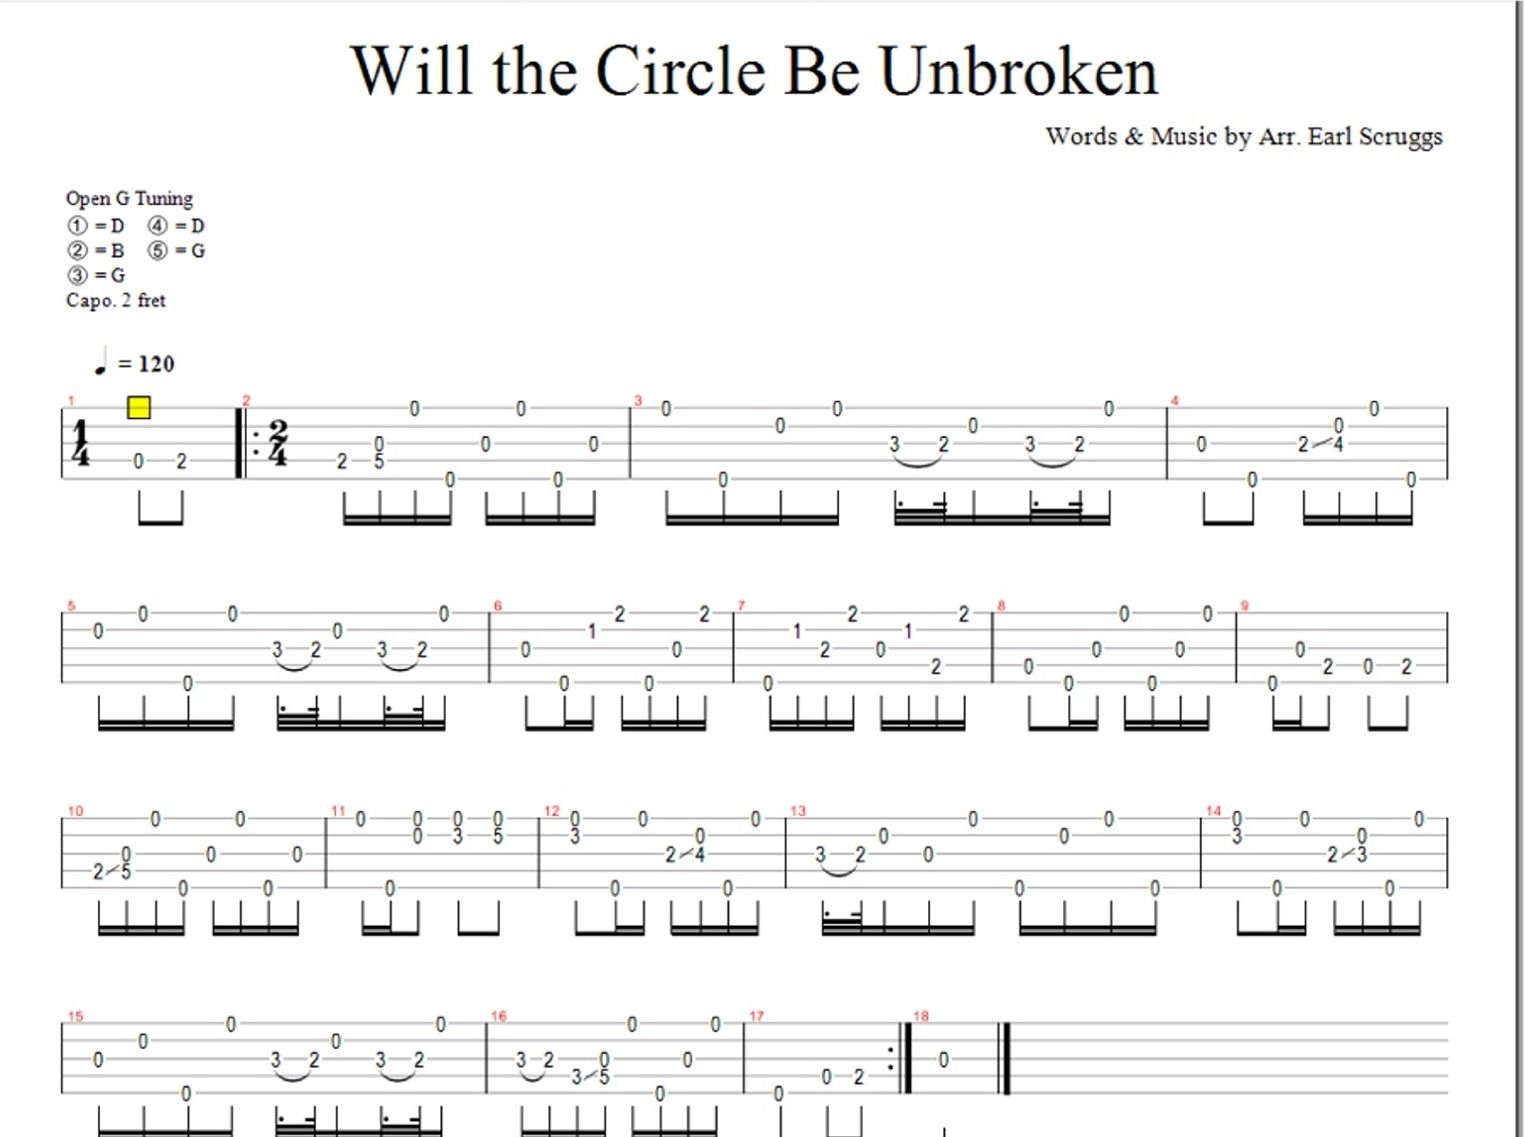 Banjo tabulaturytablaturetabtabs banjo tabulatury banjo tabulaturytablaturetabtabs hexwebz Gallery